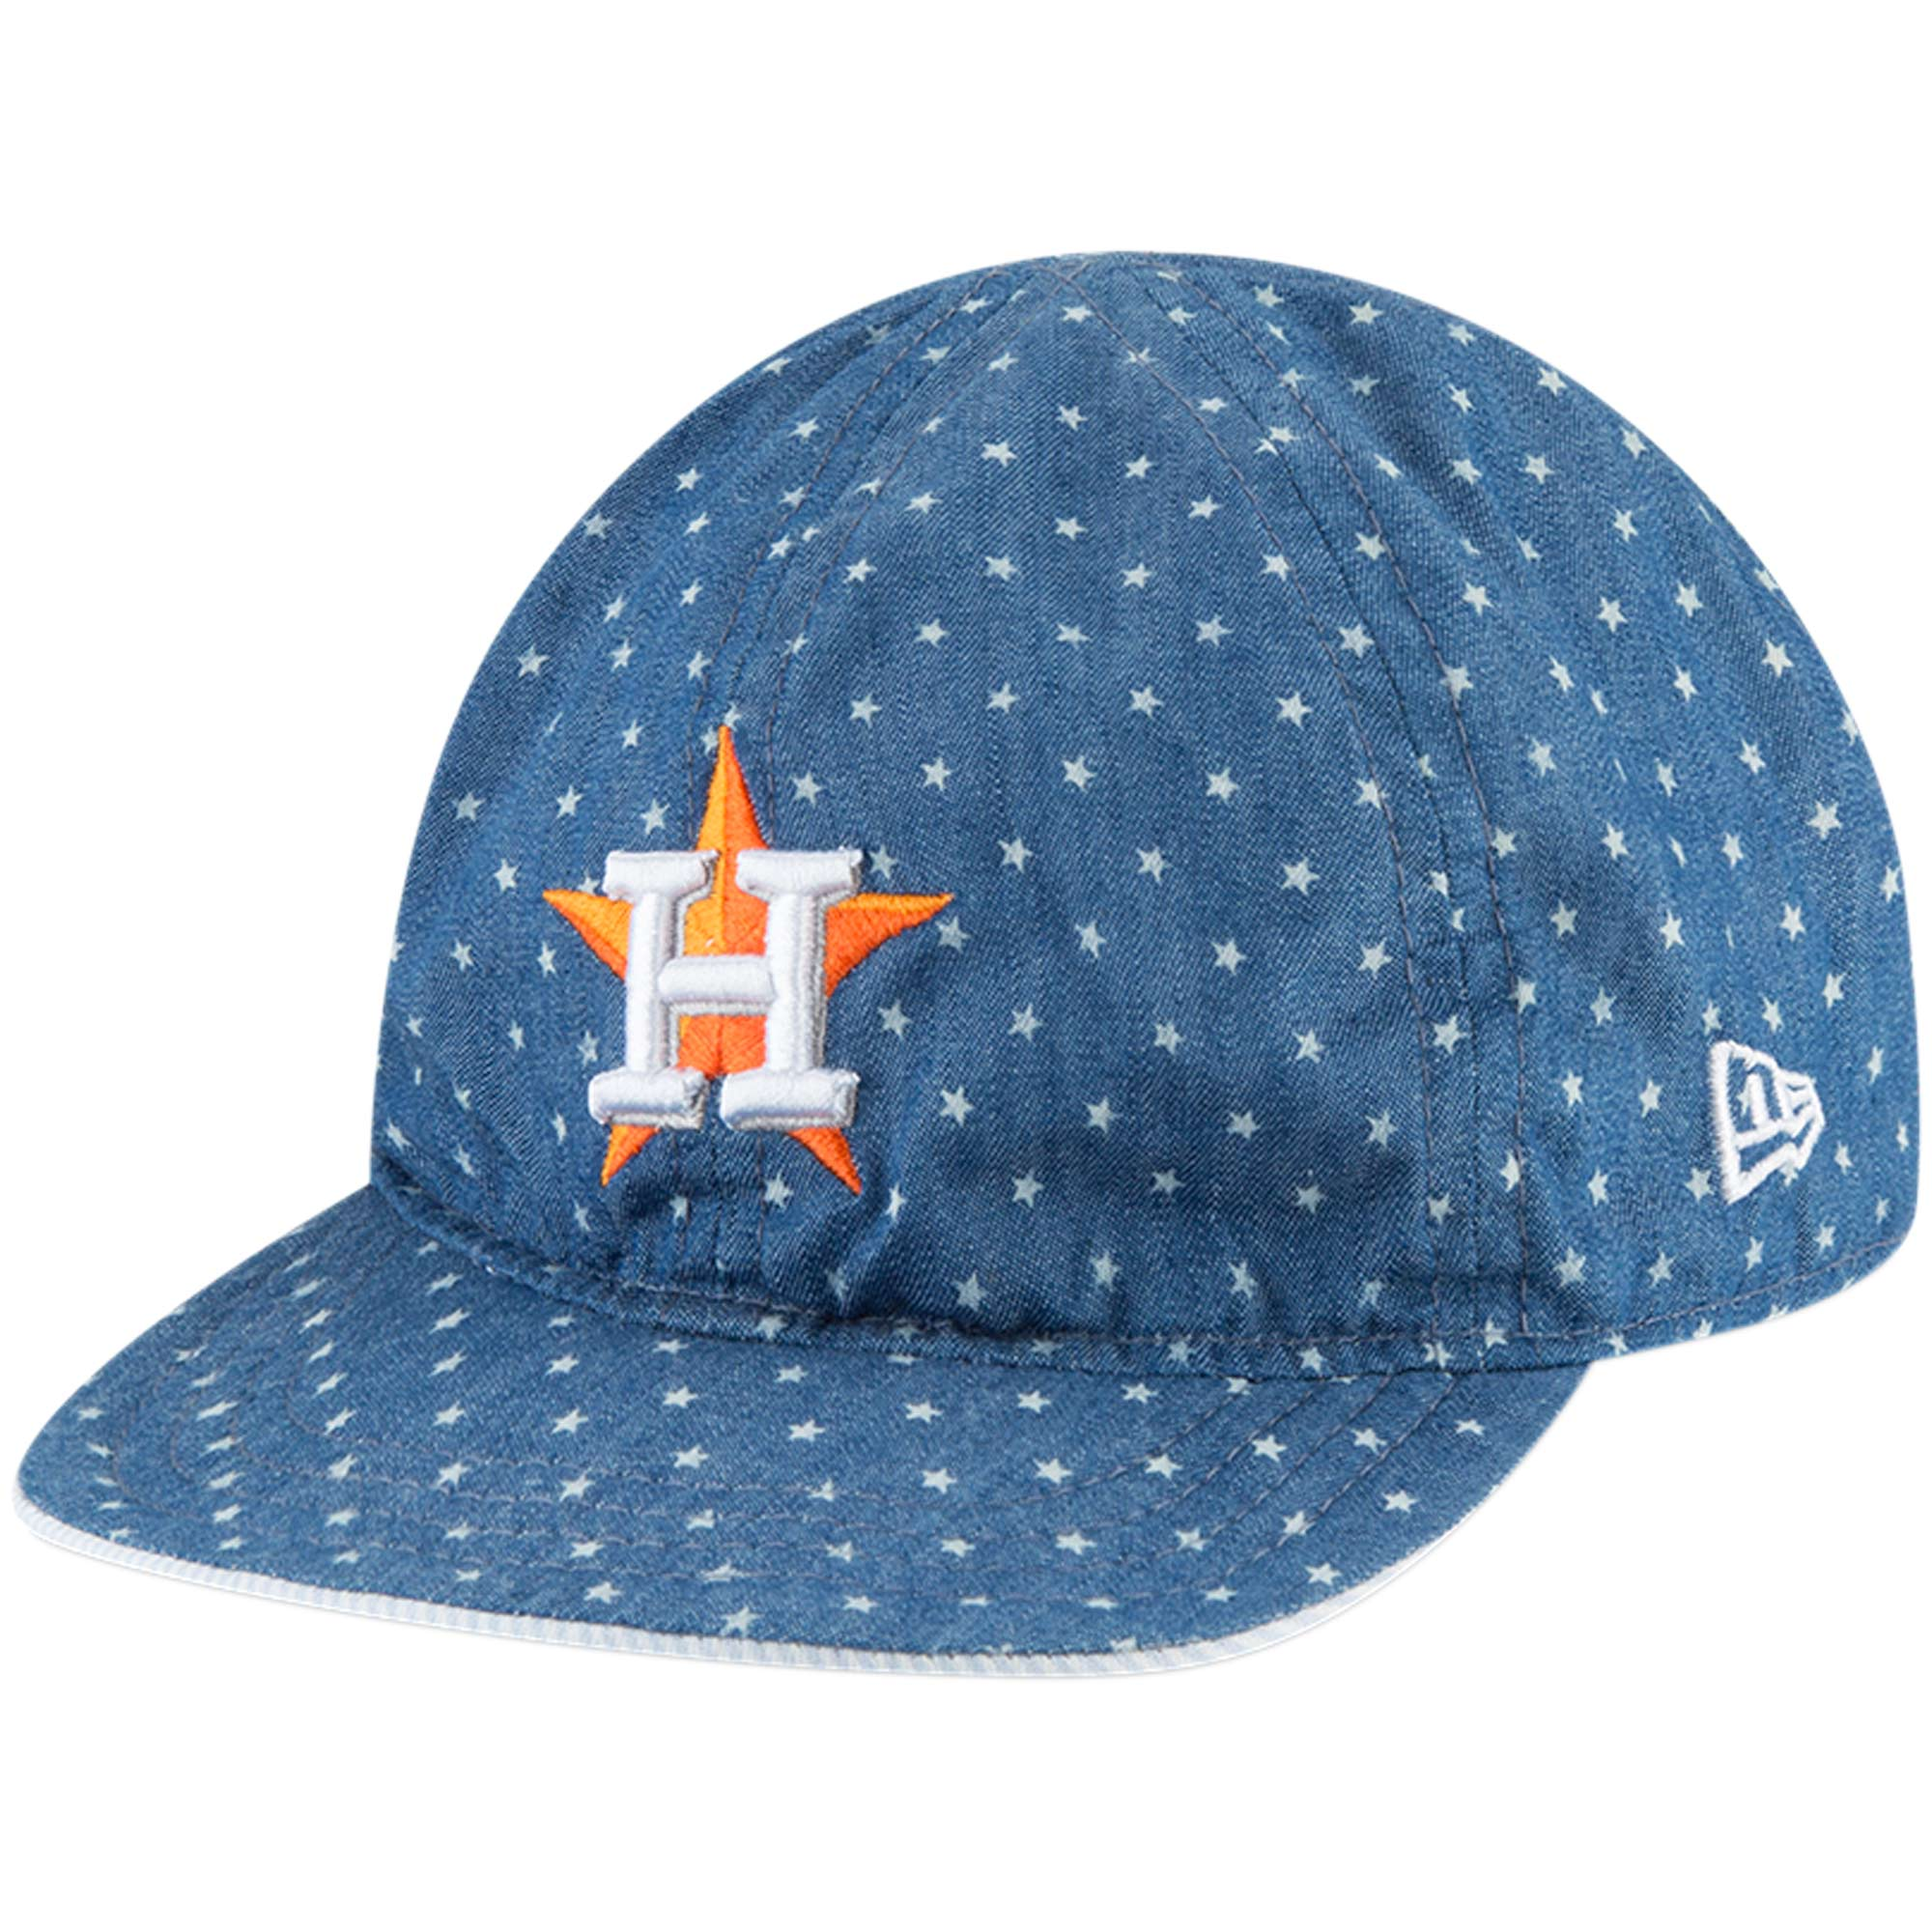 Houston Astros New Era Toddler Flip 9TWENTY Adjustable Hat - Denim - OSFA